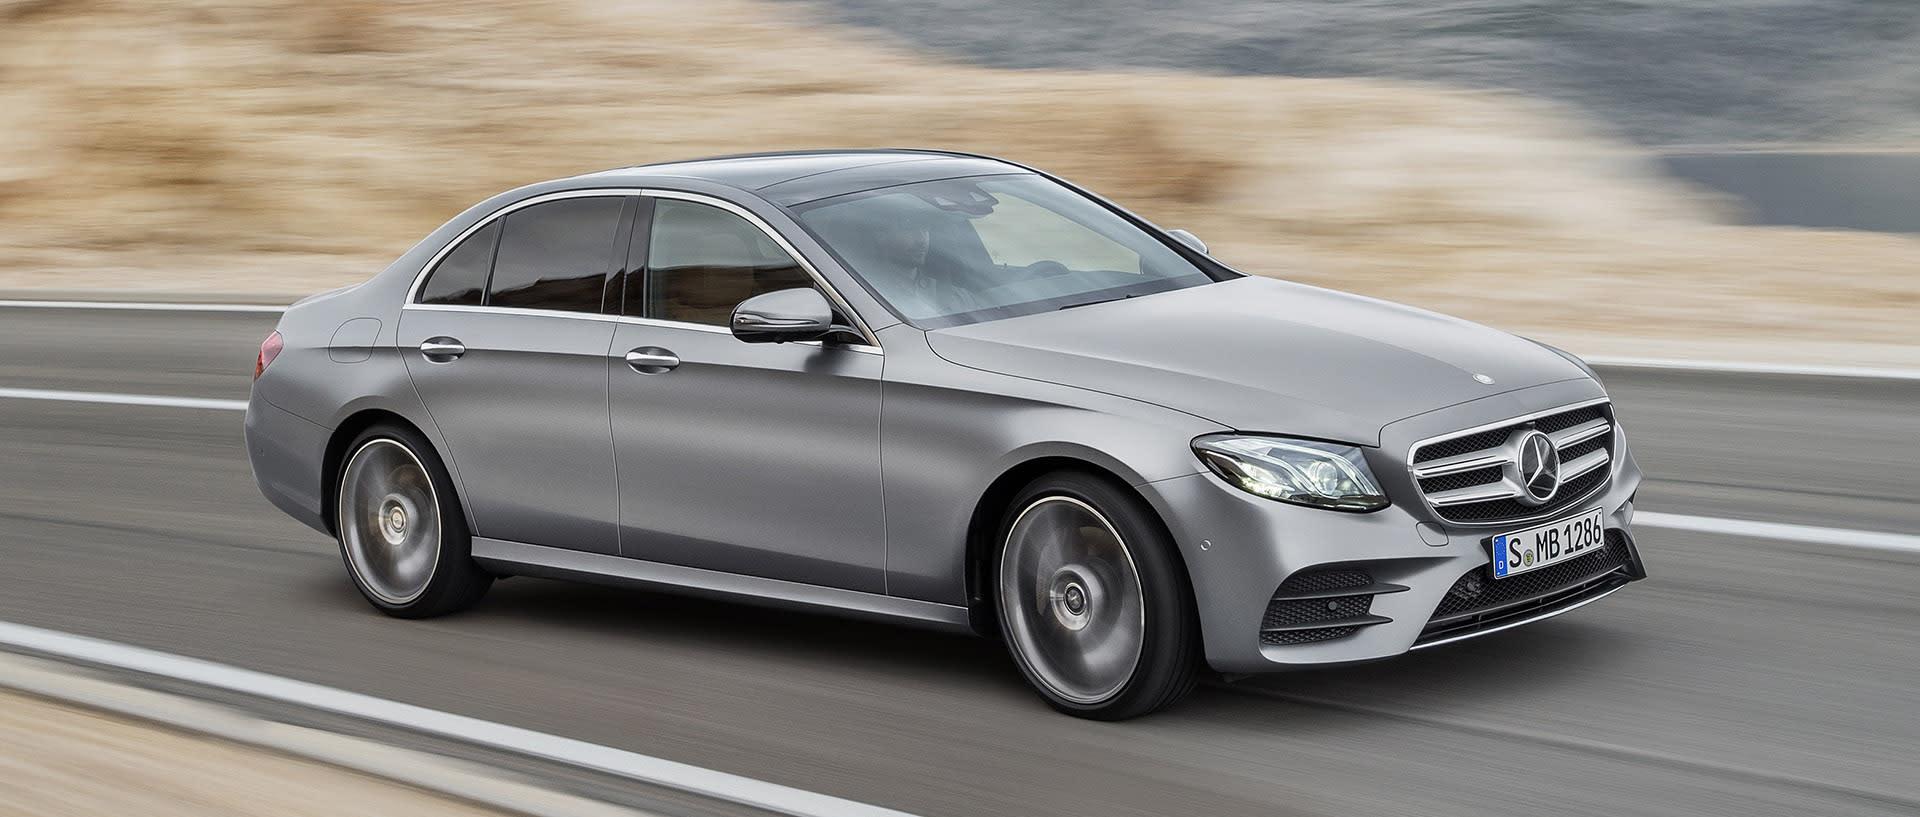 2017 mercedes benz e class grows larger and goes high tech for Mercedes benz techs